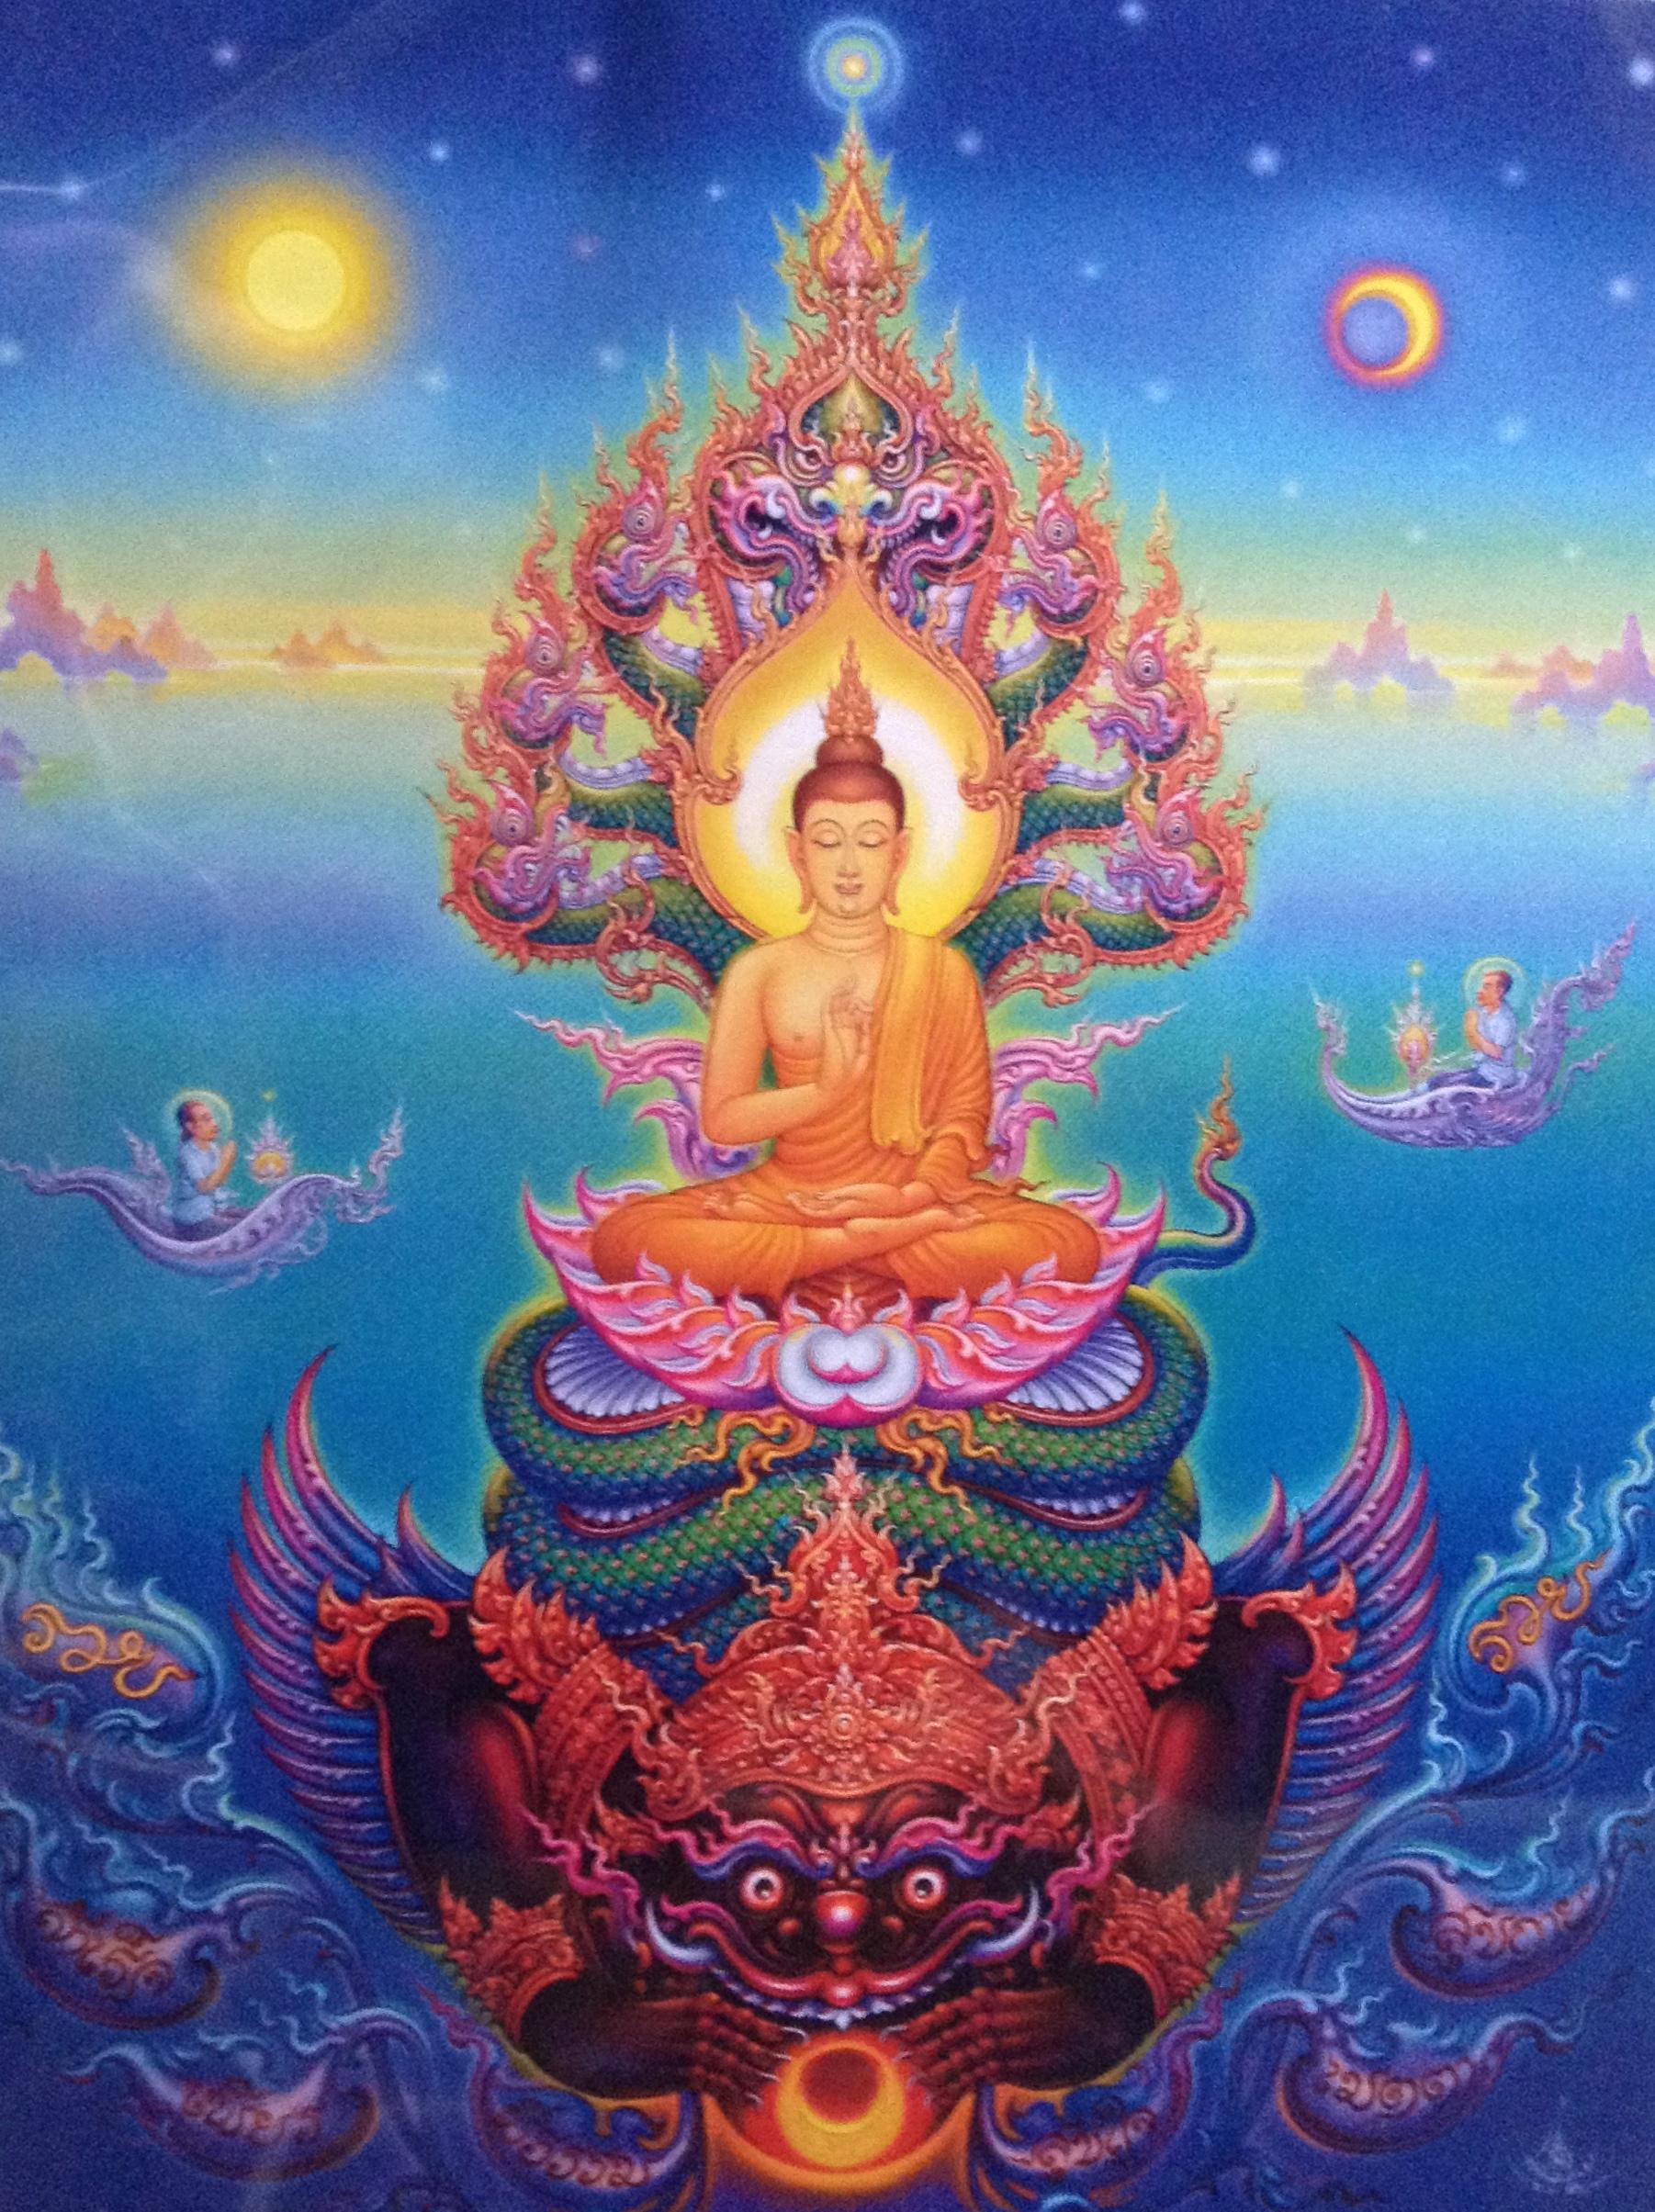 Chalermchai Kositpipat chalermchai kositpipat | land of infinite possibilities